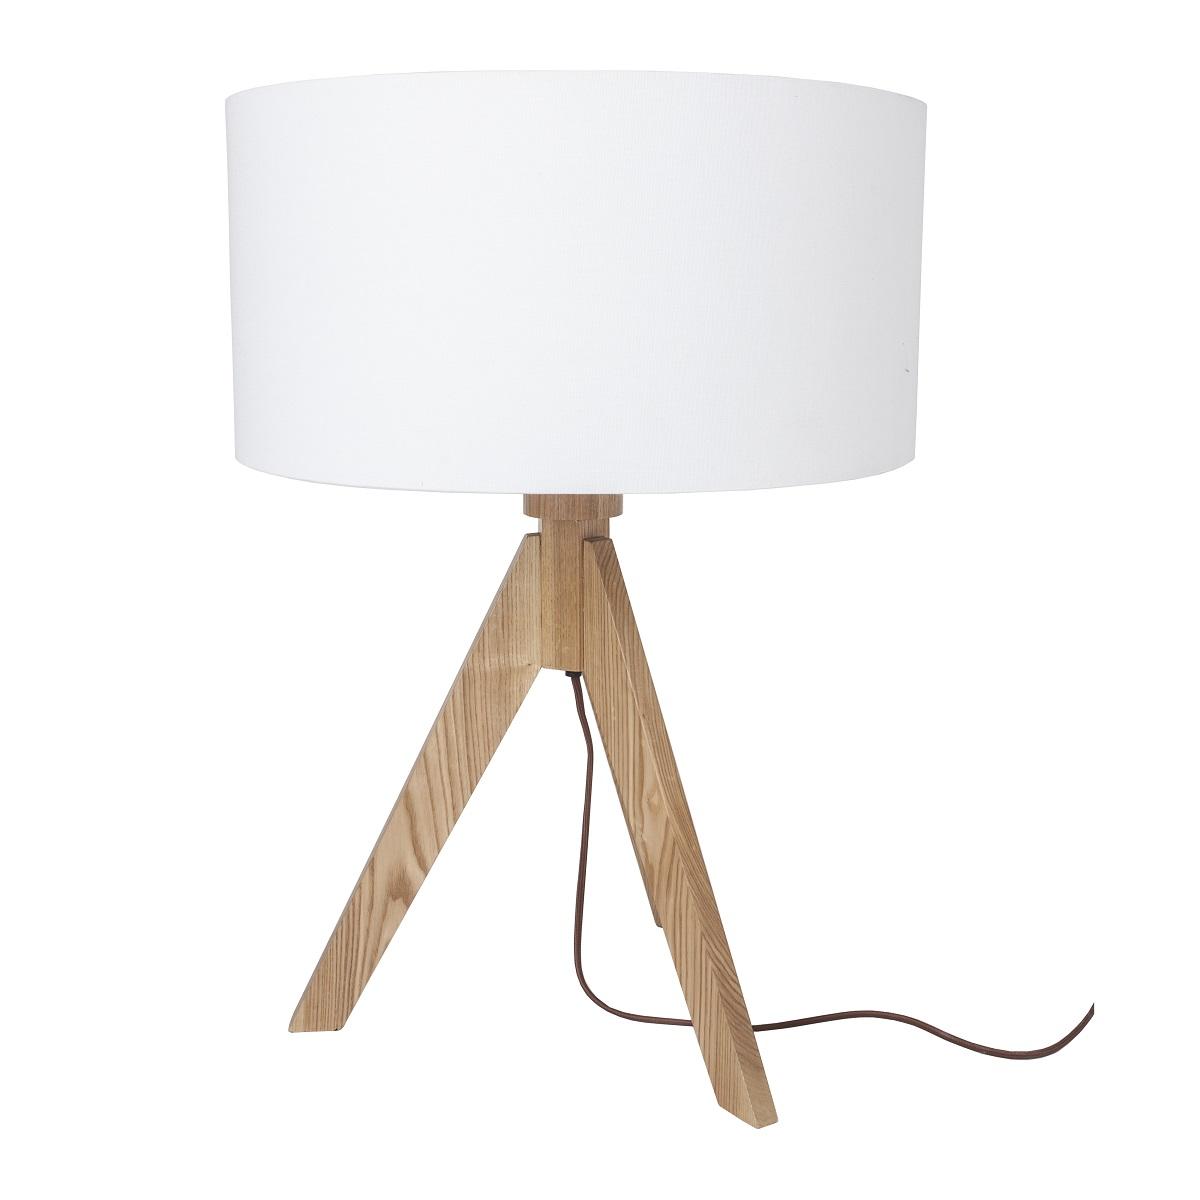 lampenhelden vandeheg tischleuchte elv holz metall wei 40 x h48 cm max 60 watt online kaufen. Black Bedroom Furniture Sets. Home Design Ideas